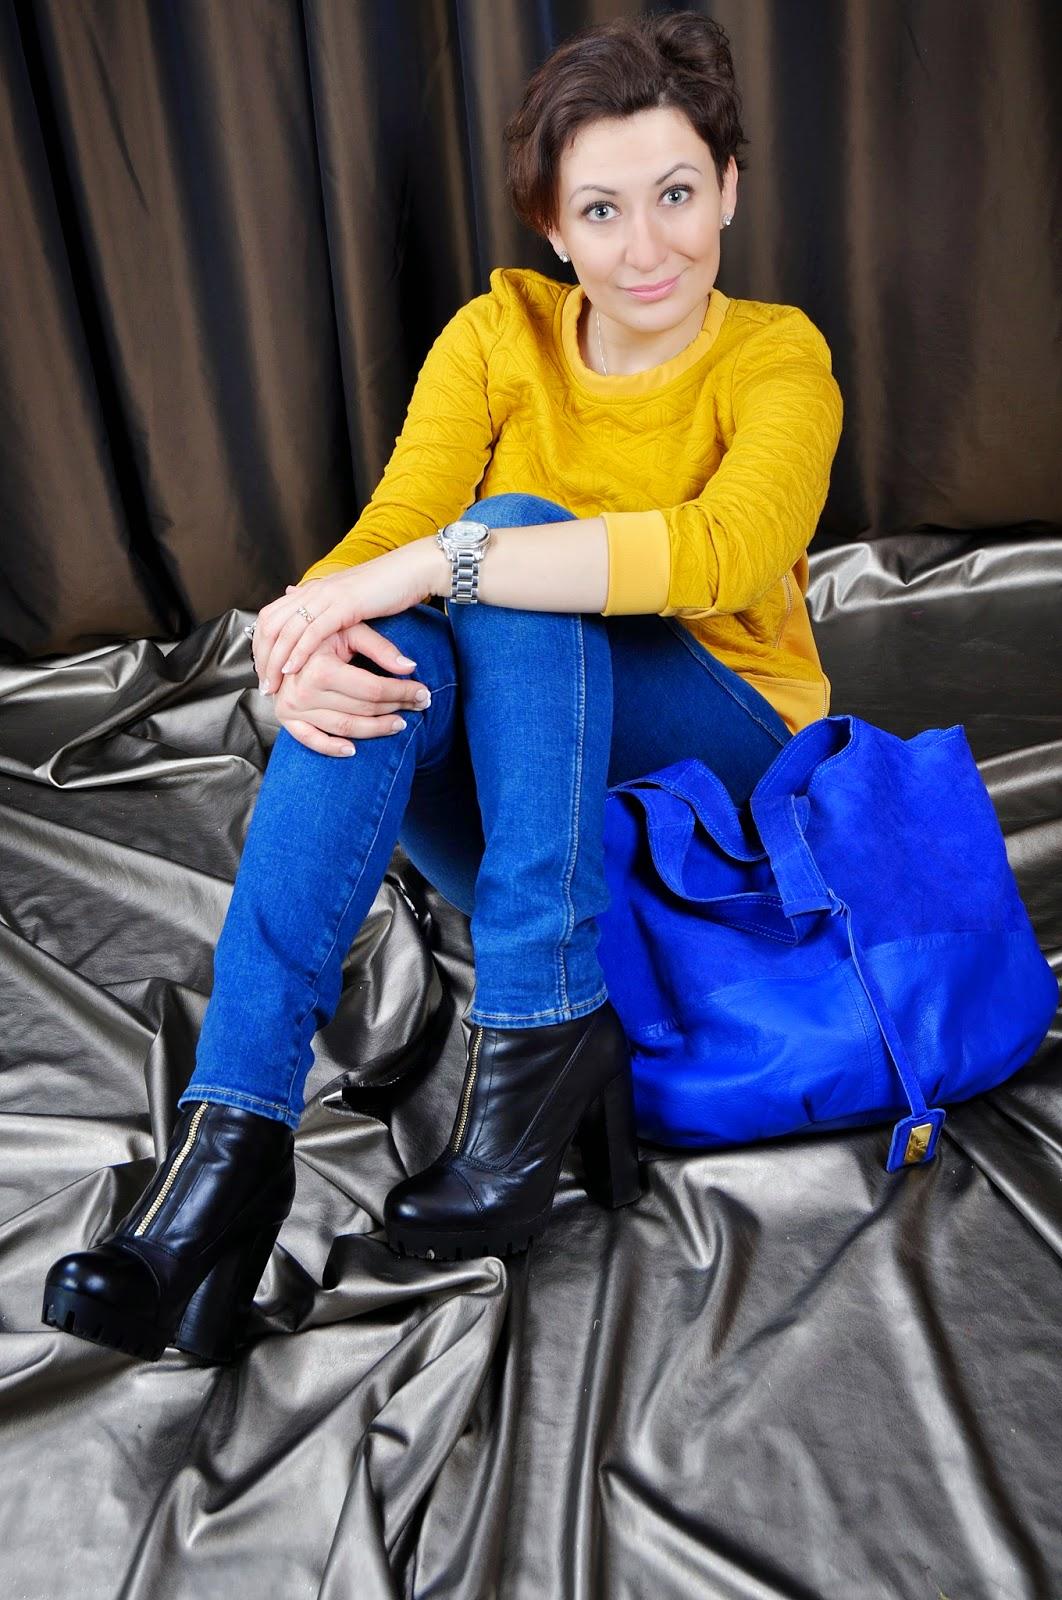 Fashion, moda, River Island Ankle Paltform Boots, Suede Bag, SheInside Coat, SheInside Sweatshirt, Stylizacja, Wrangler Jeans, blog modowy Puławy, Adriana Style Blog,